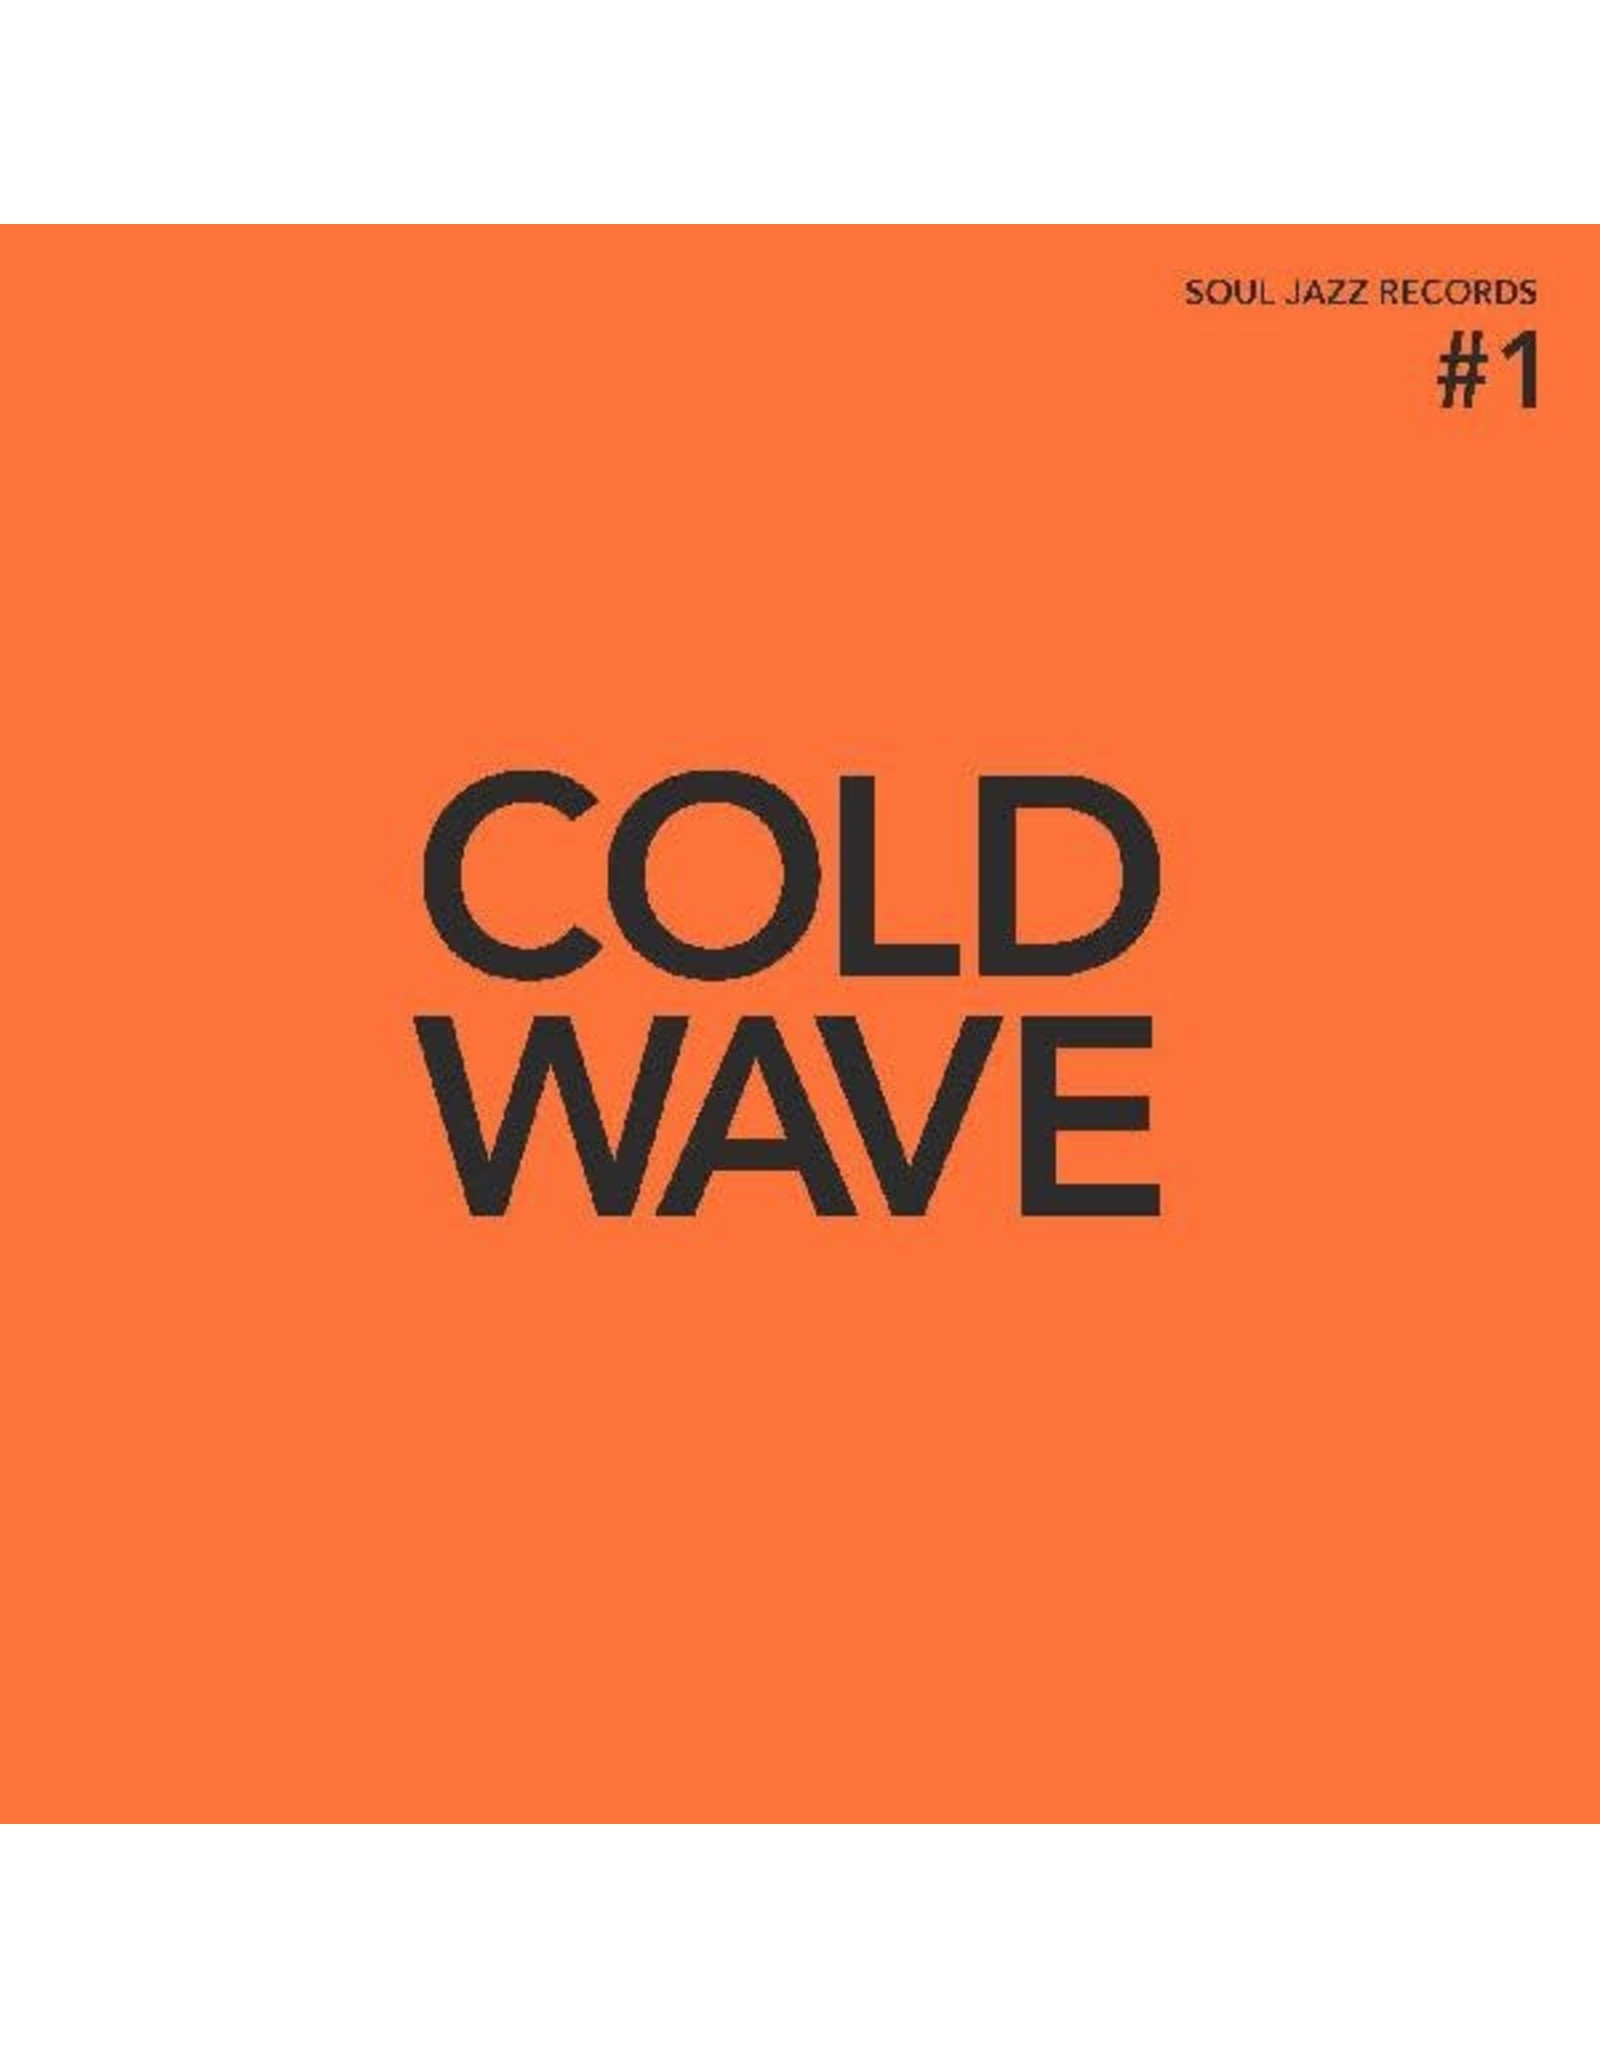 New Vinyl Various - Soul Jazz Records Presents: COLD WAVE #1 2LP